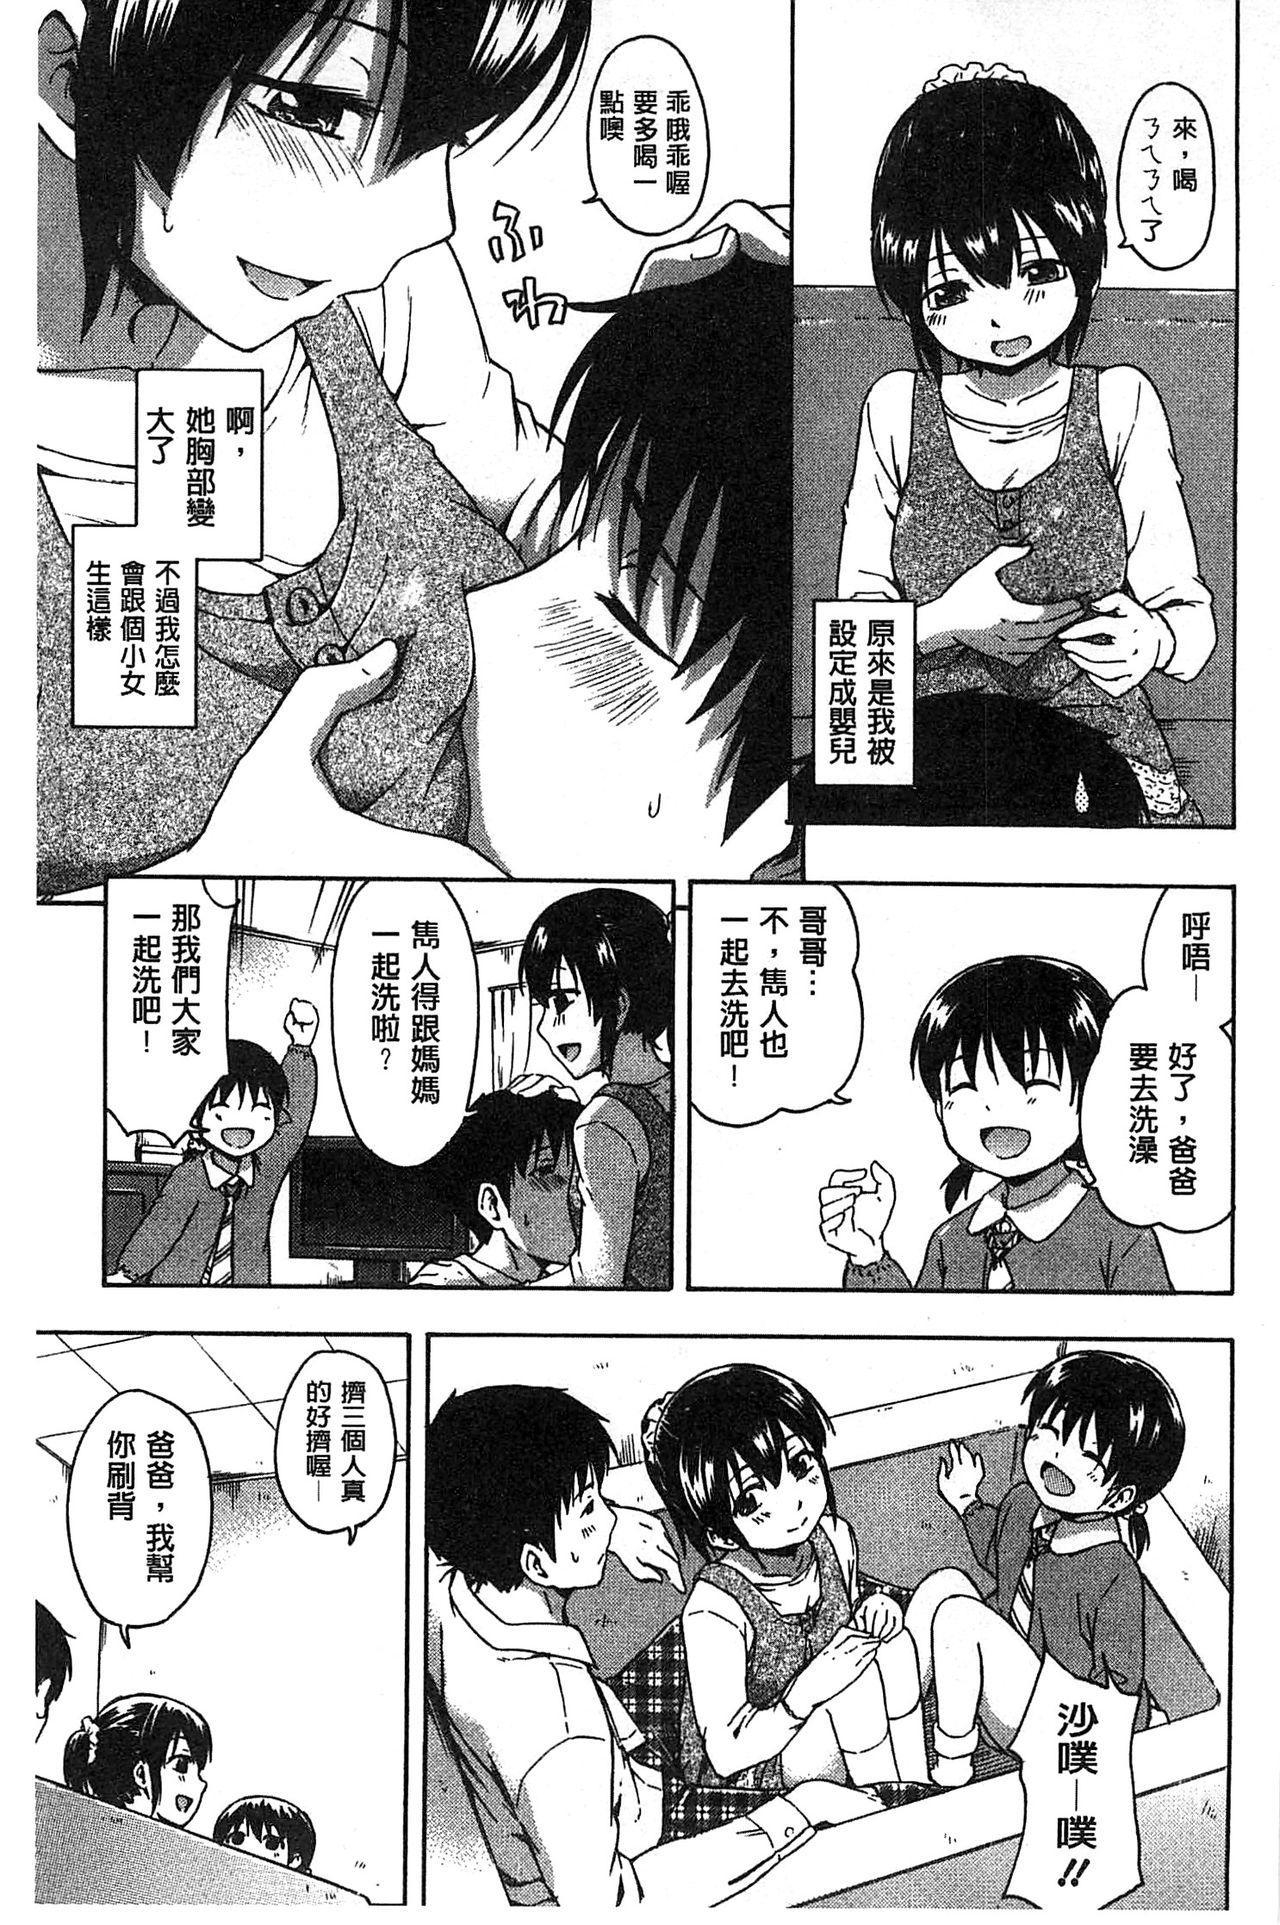 Kokoro Gohoubi | 心靈的褒美 167